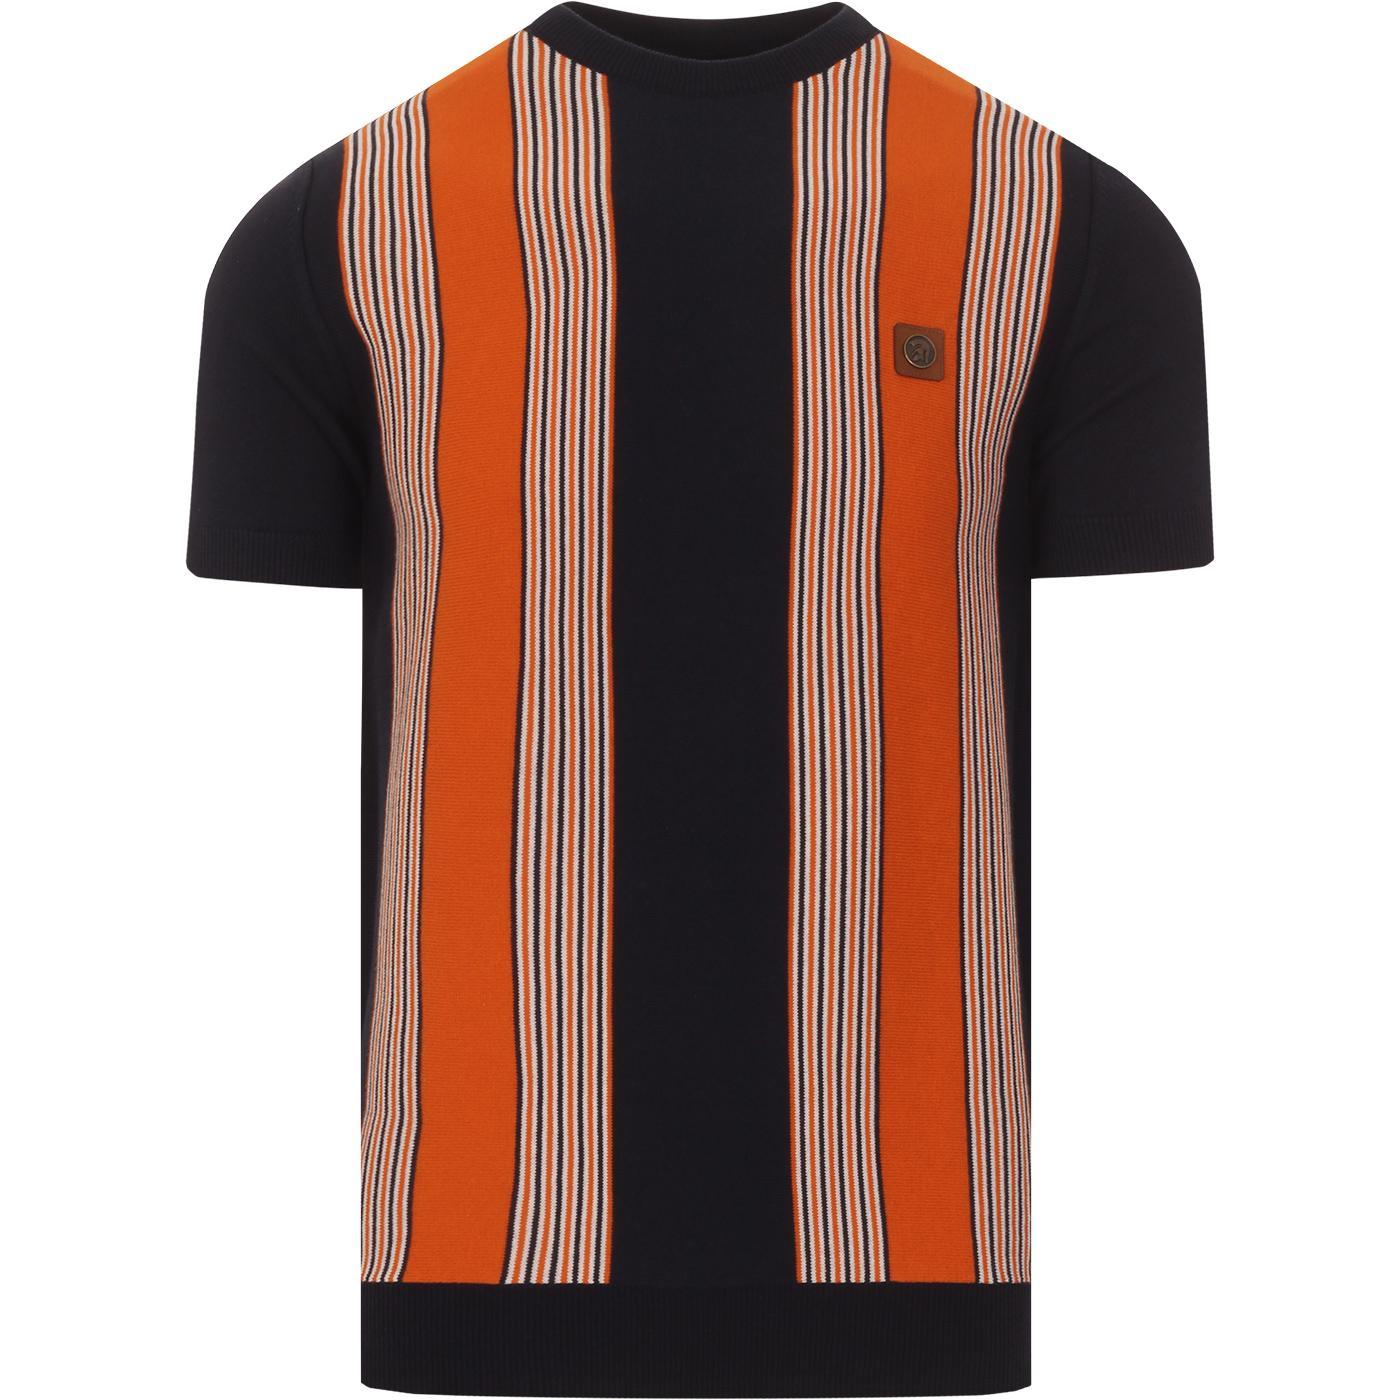 TROJAN RECORDS Retro Mod Stripe Knit Tee (Navy)